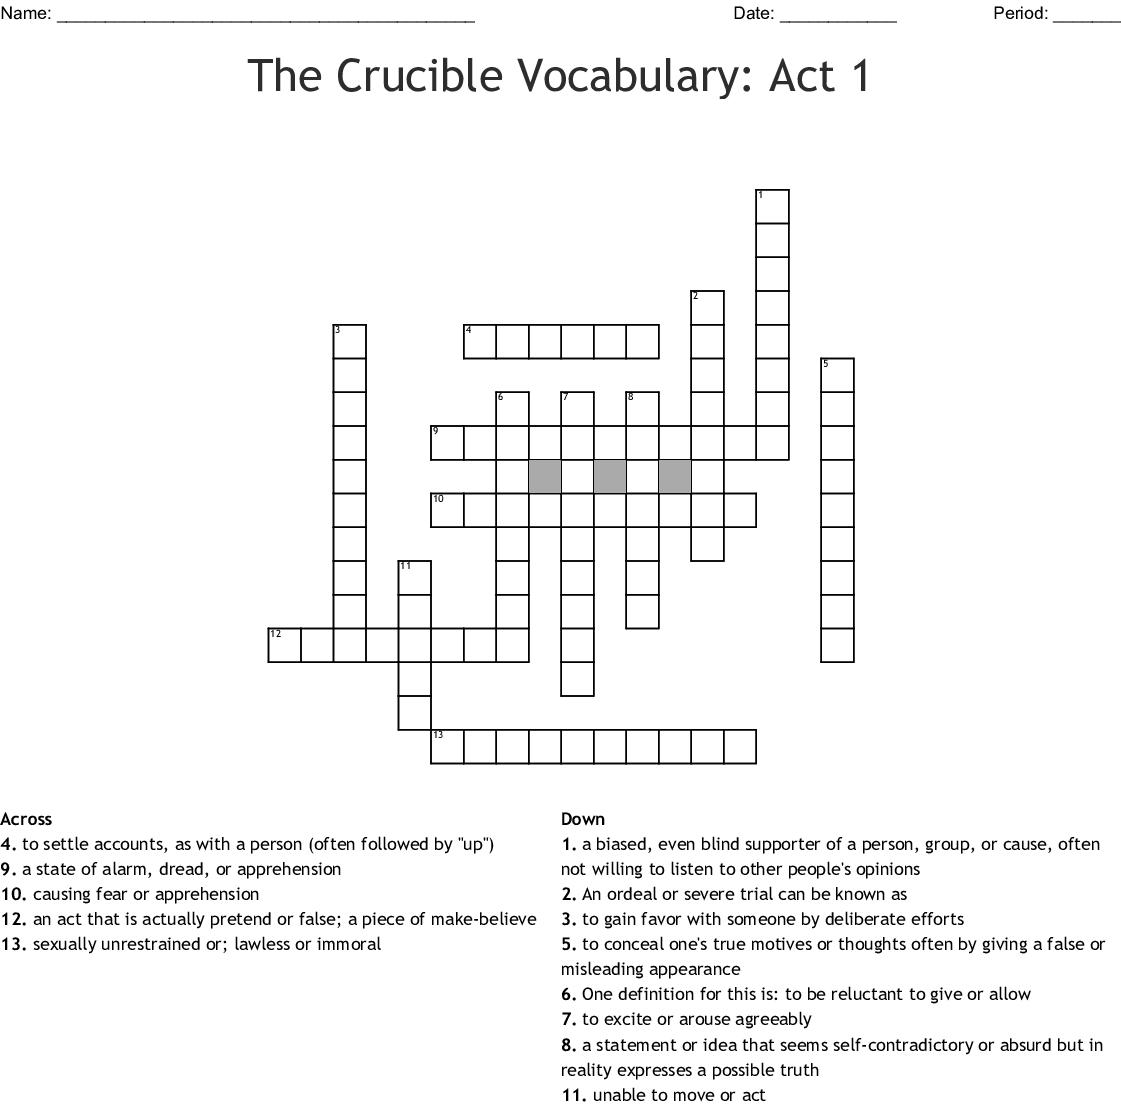 The Crucible Vocabulary Act 1 Crossword